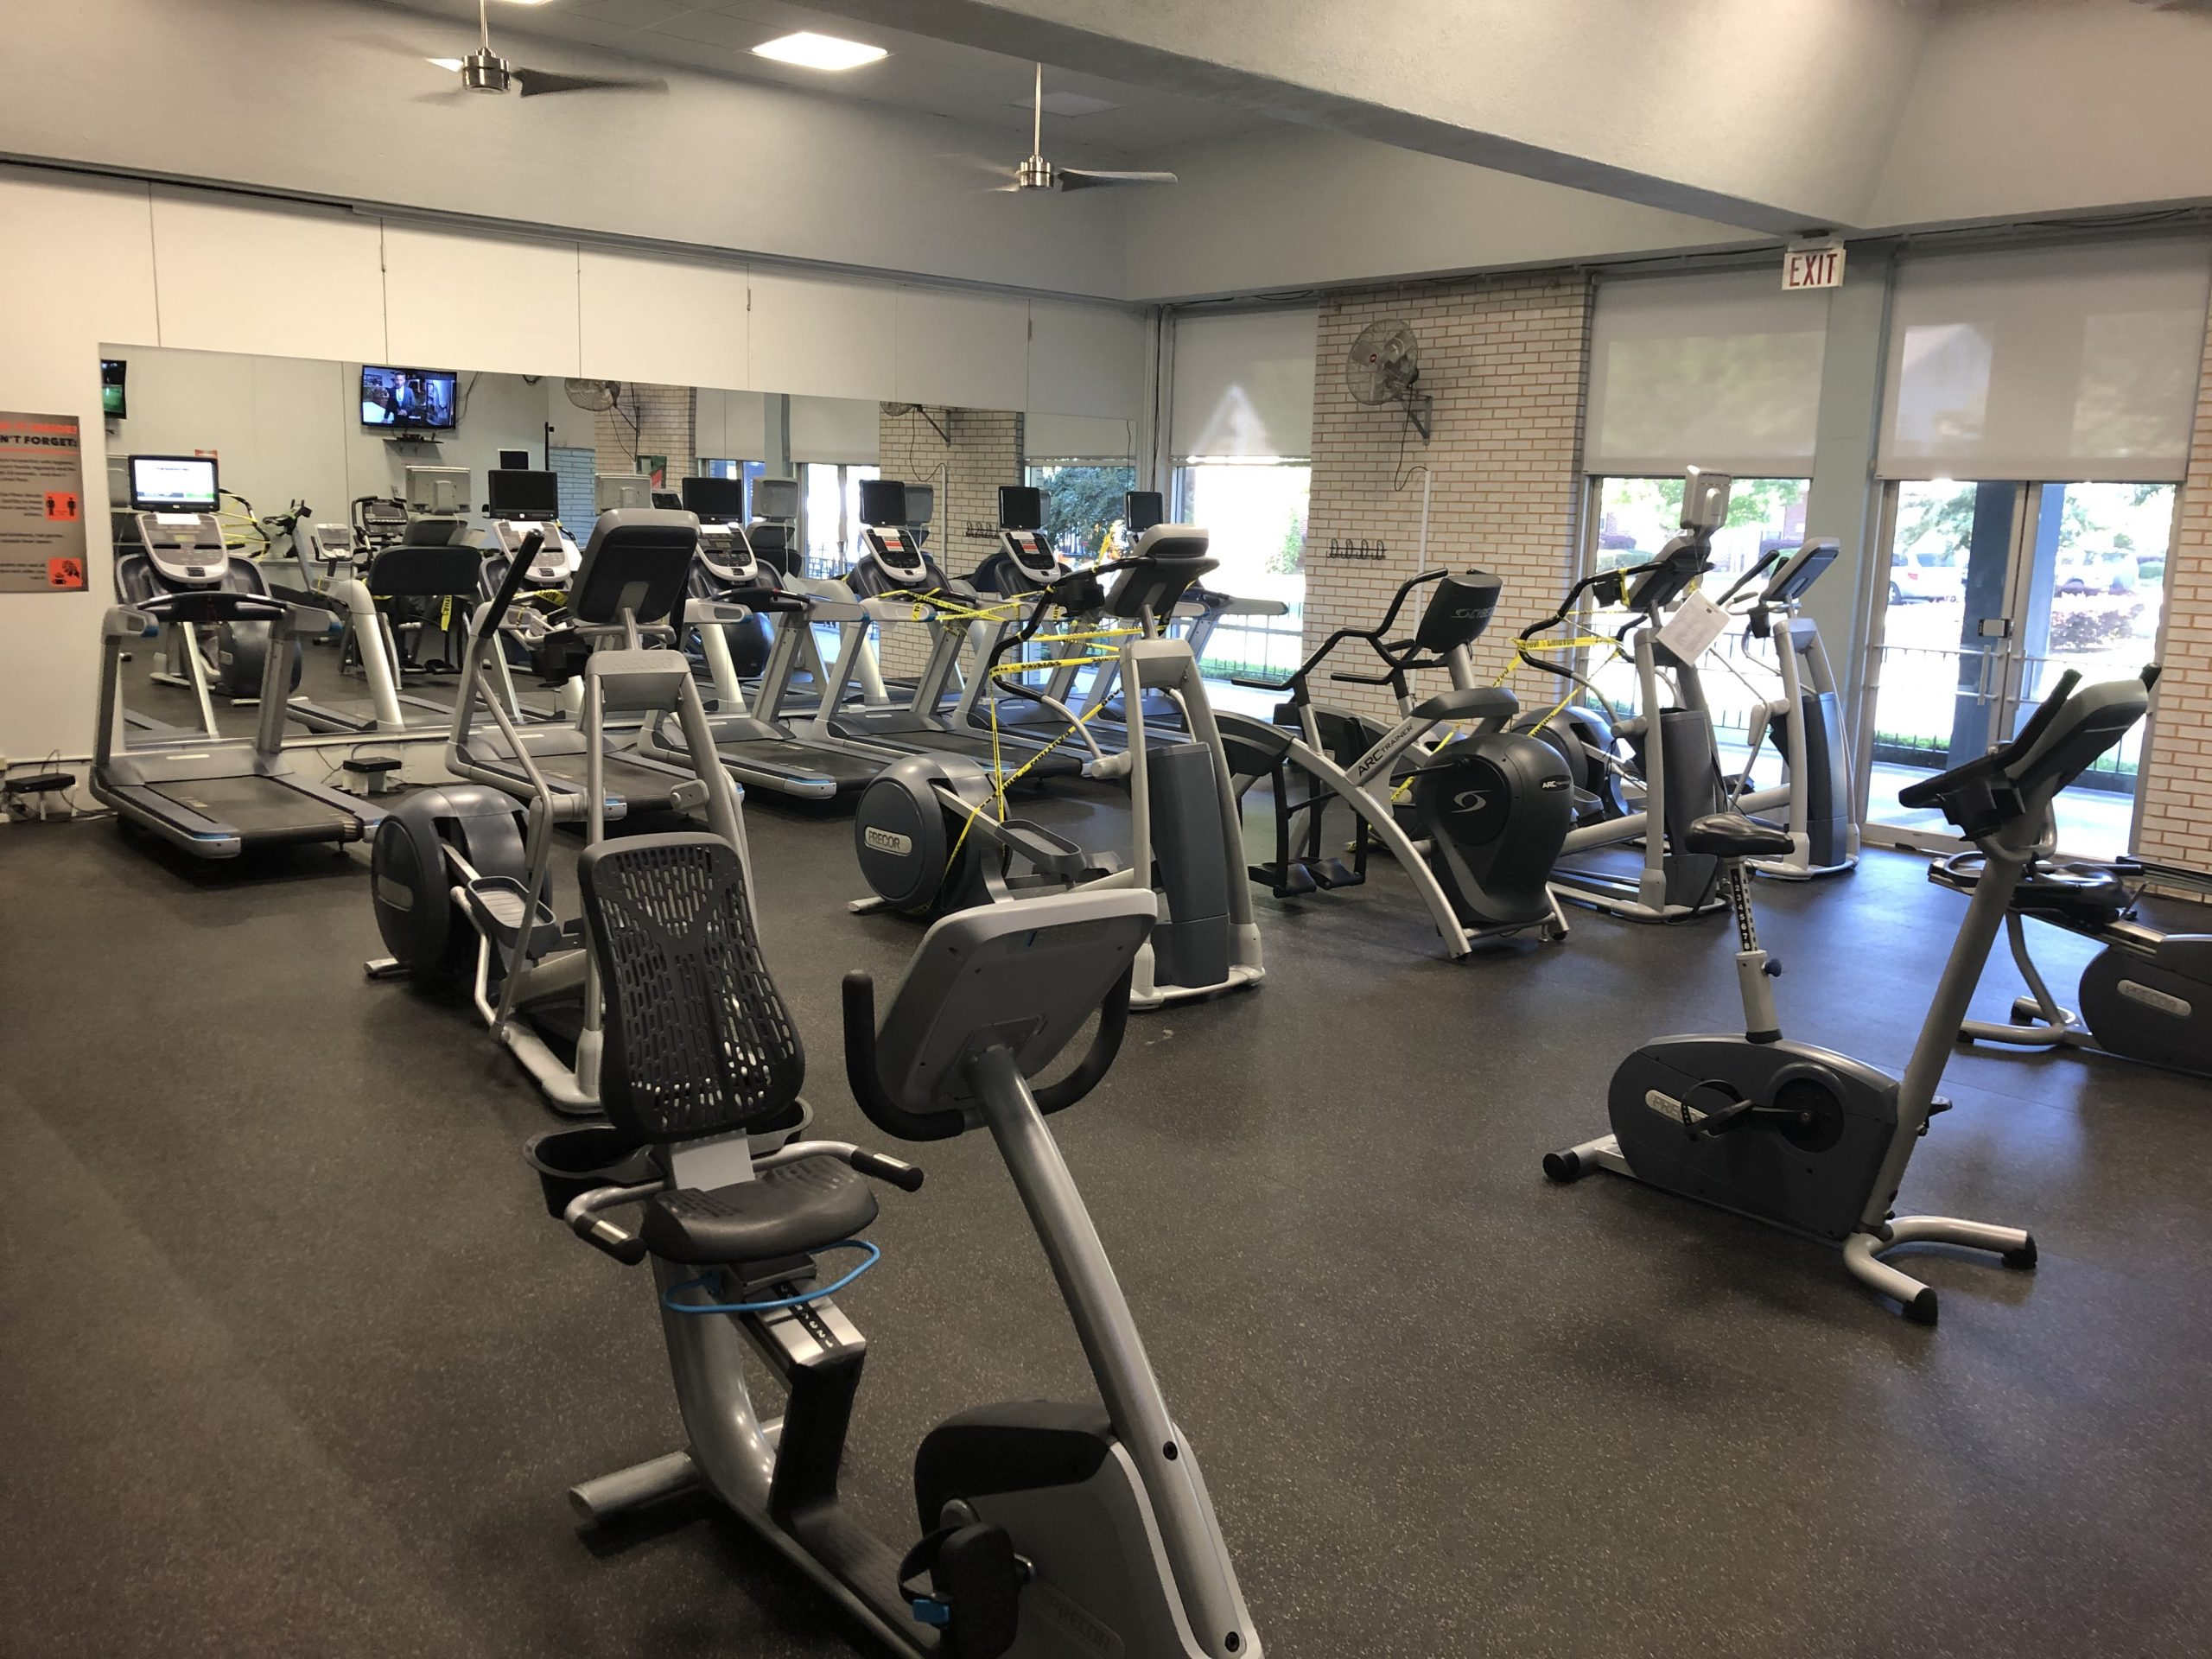 COVID19, social distancing, fitness center, YWCA, gym, co-ed gym, workout, cardio gym, treadmill, elliptical, stationary bike